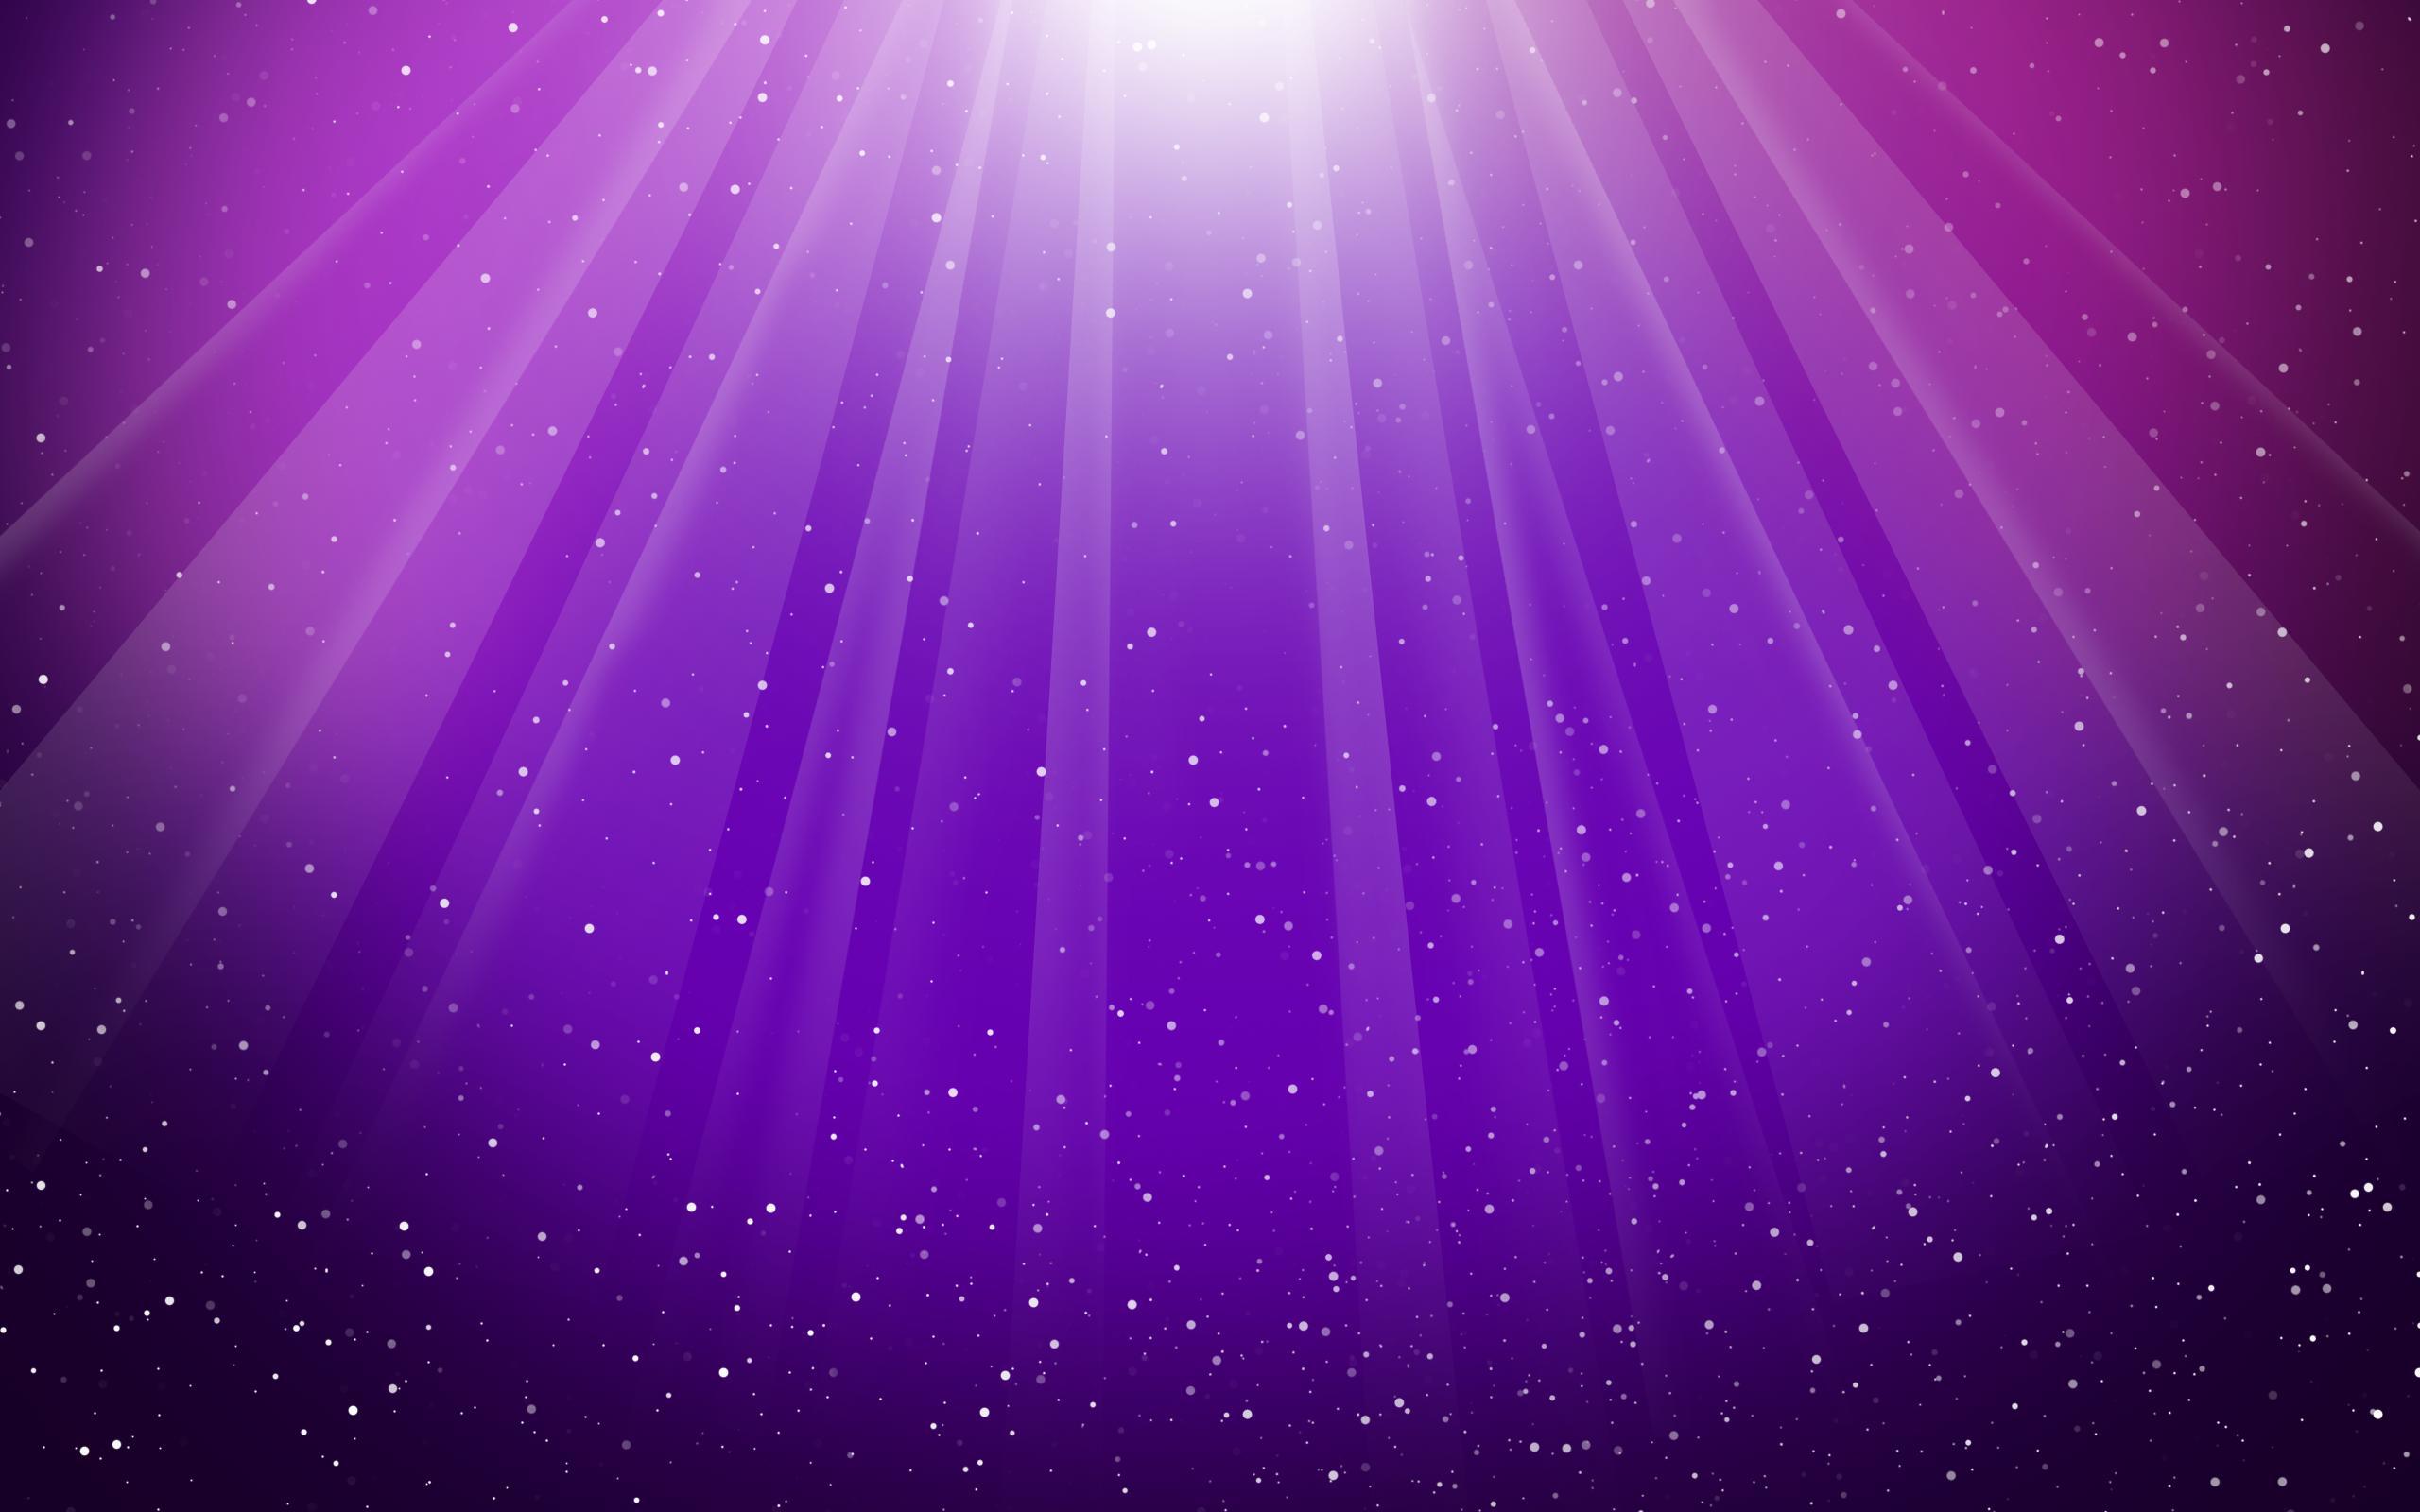 purple backgrounds hd - wallpaper cave